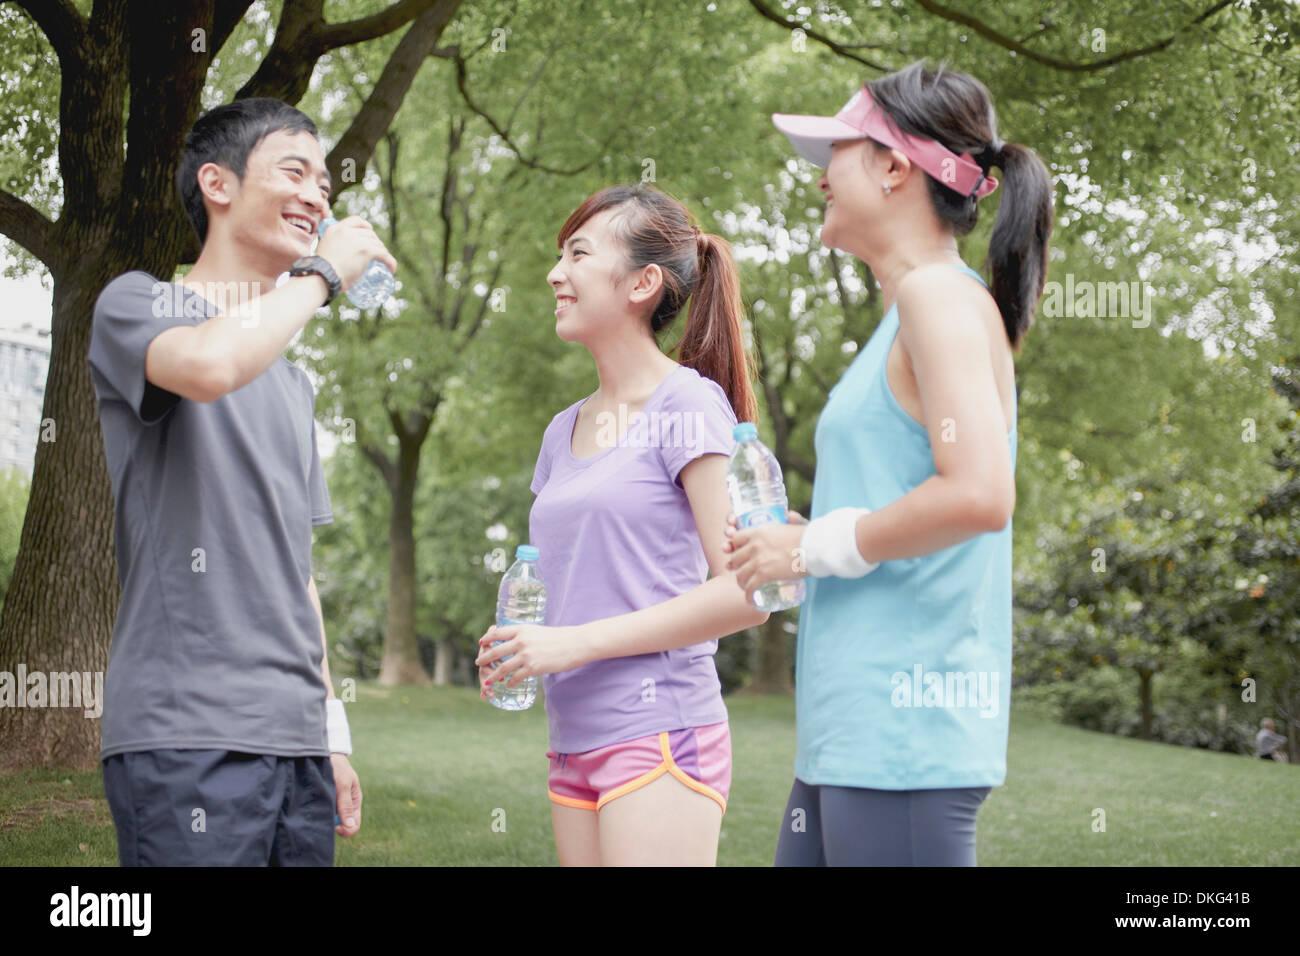 Jogger friends taking a break in park - Stock Image